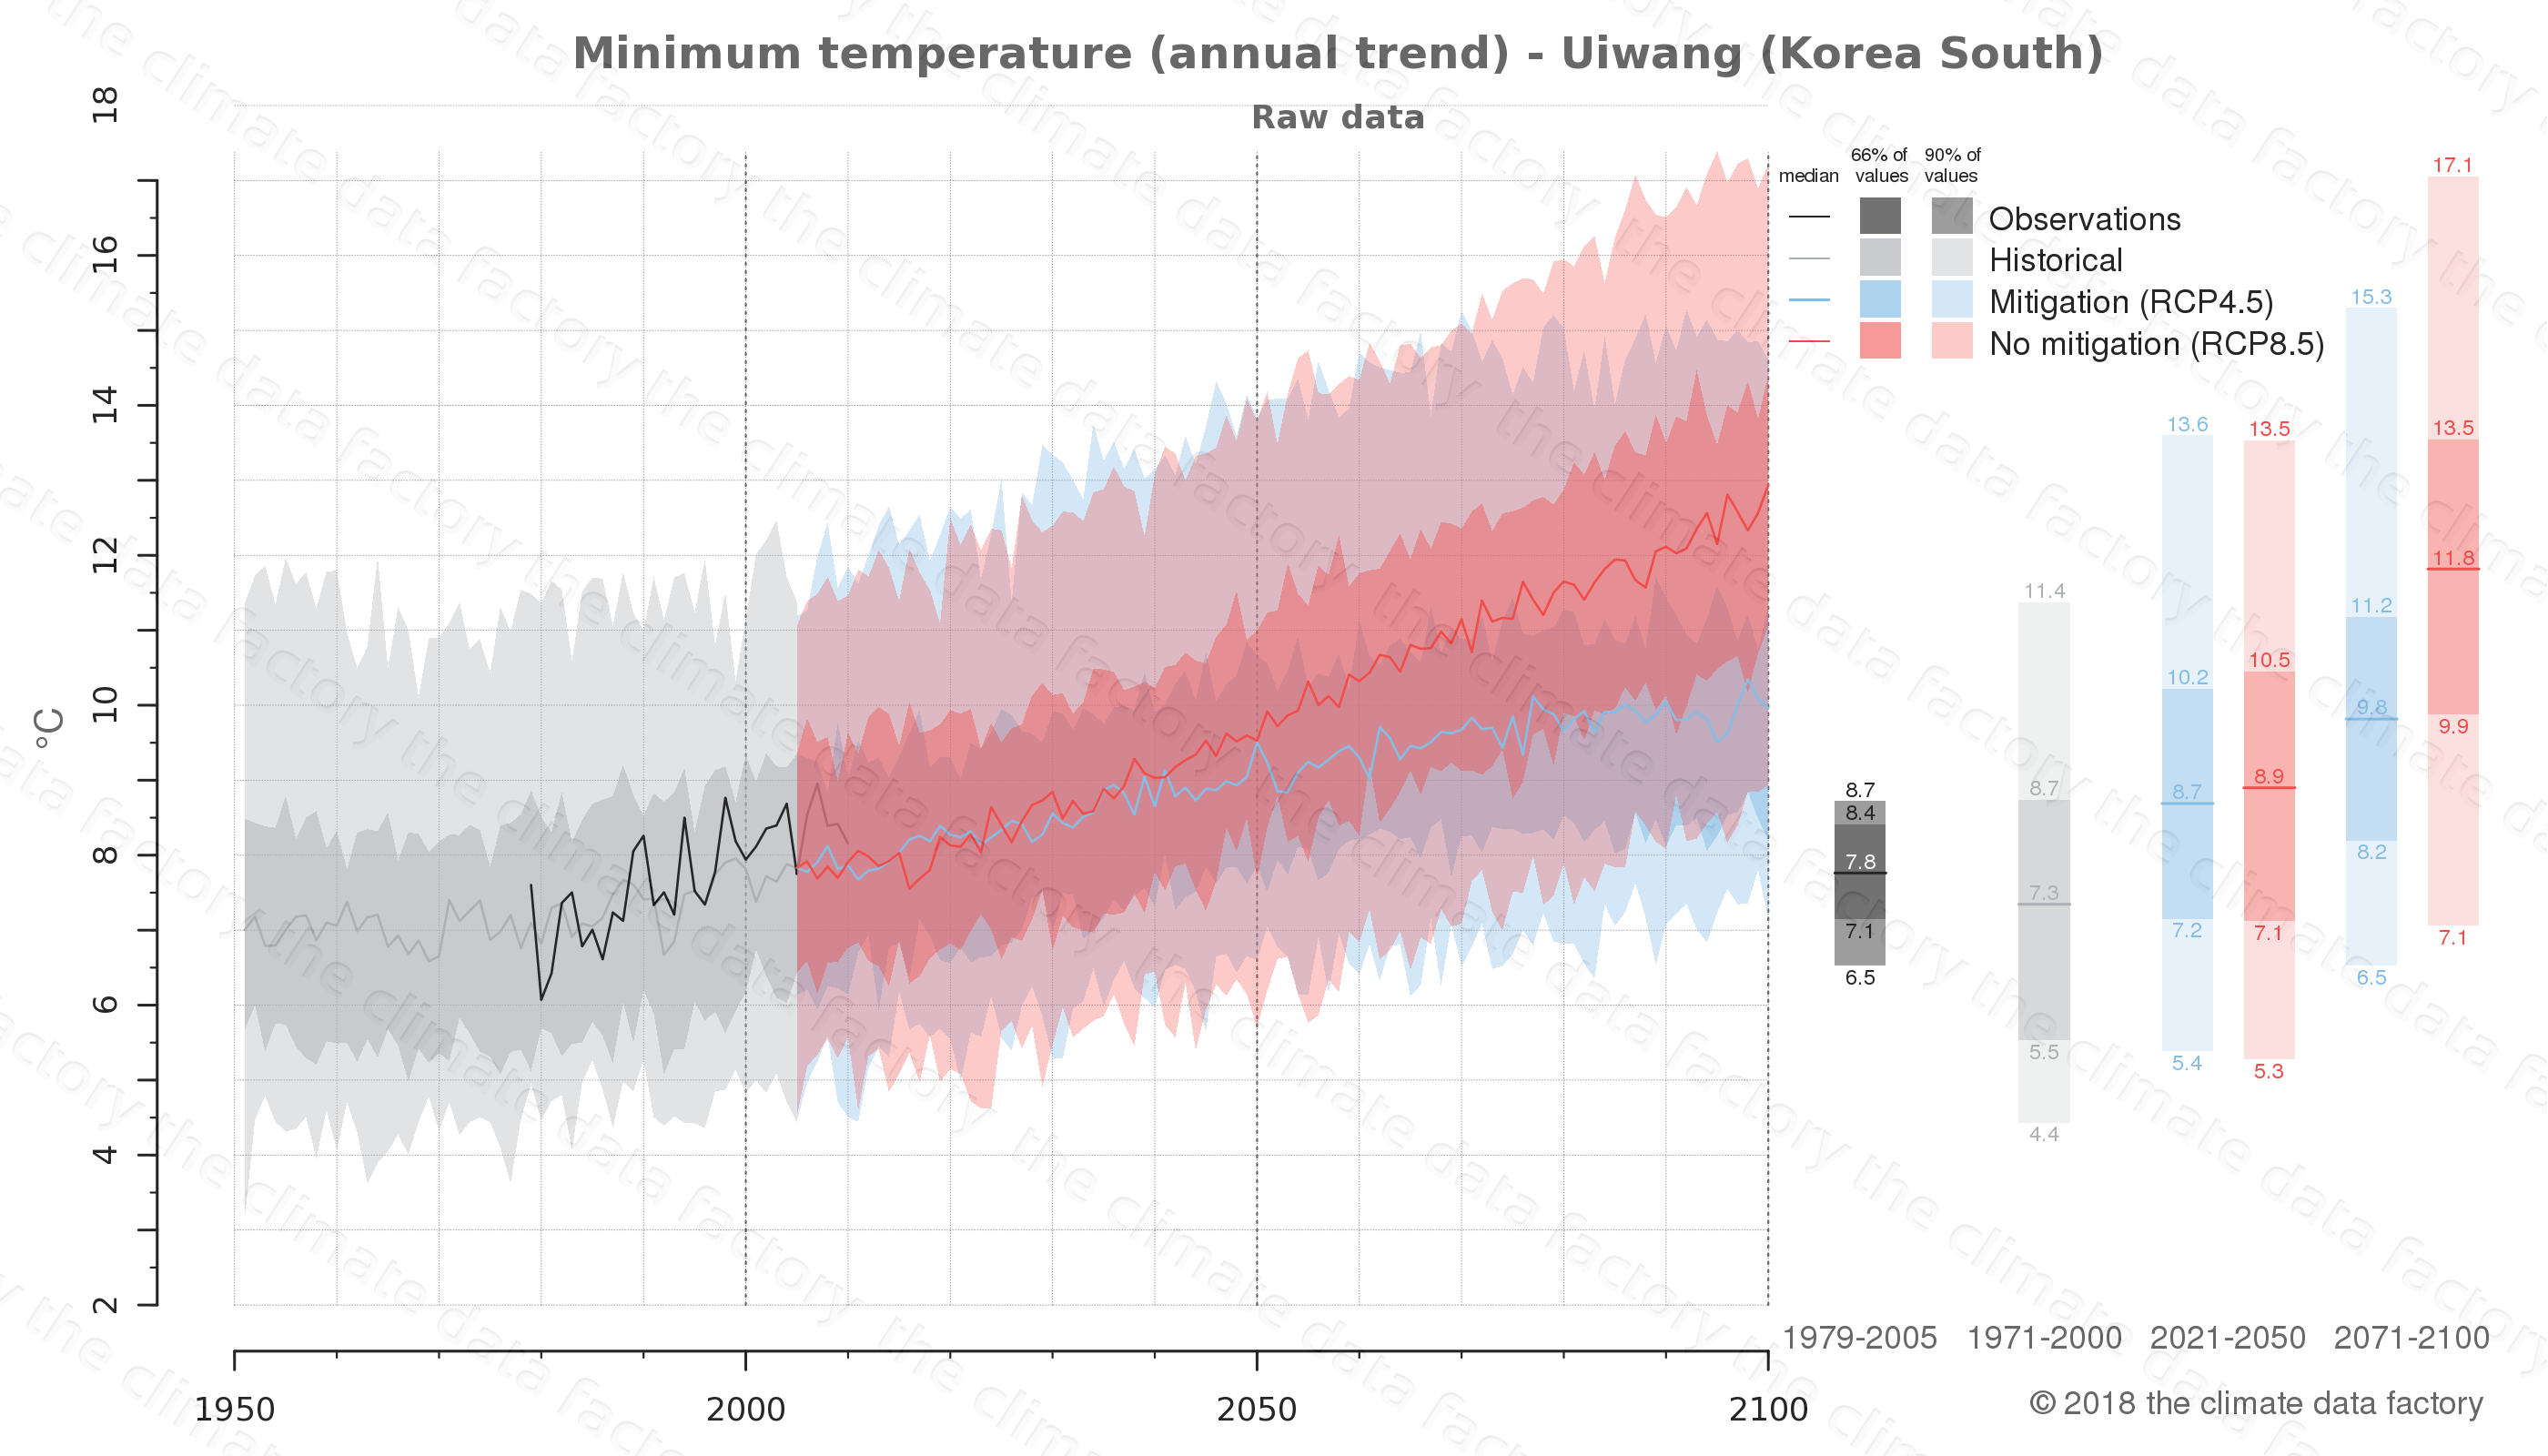 climate change data policy adaptation climate graph city data minimum-temperature uiwang south korea